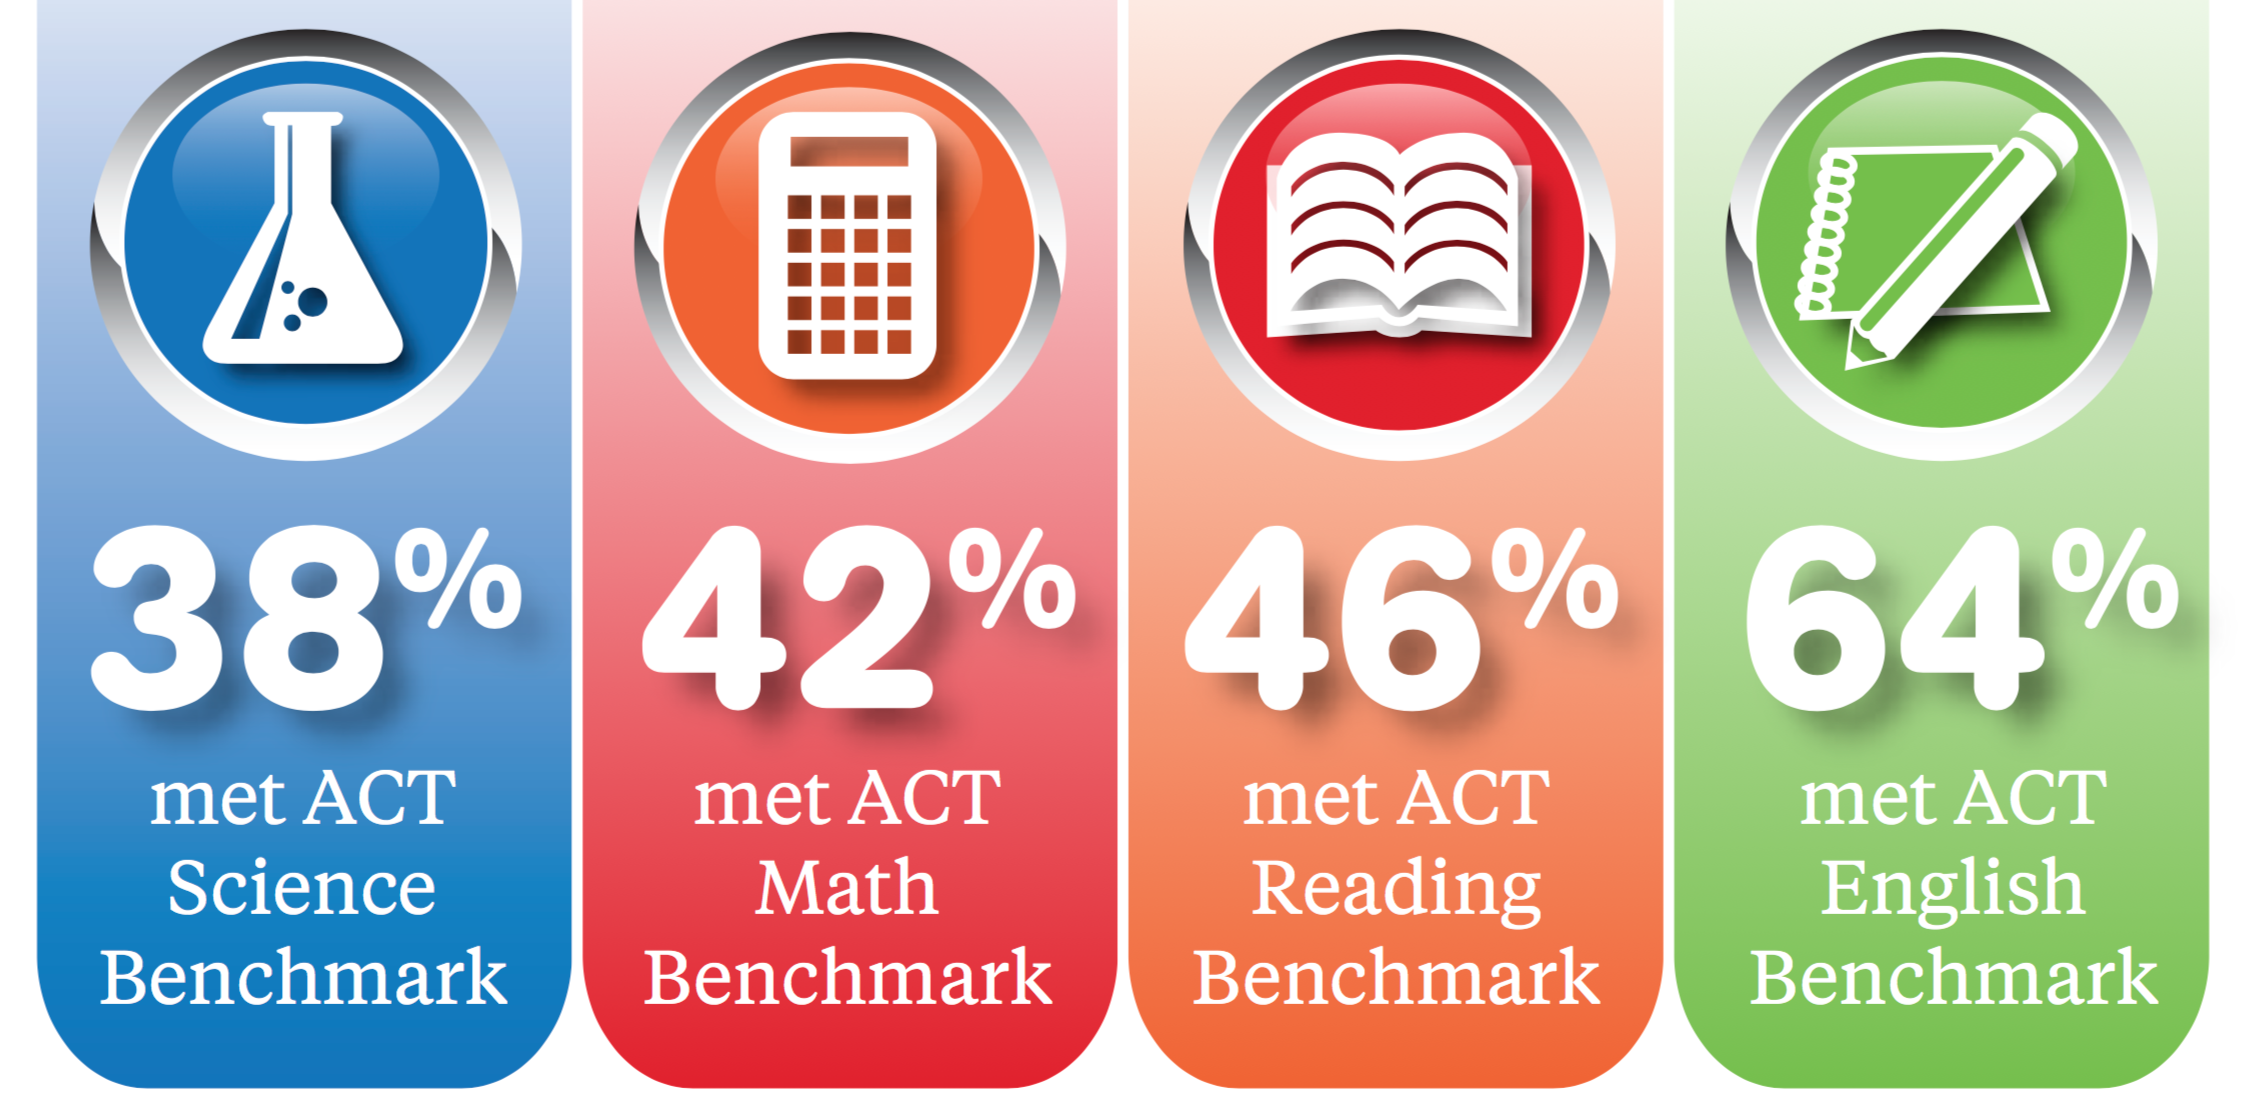 https://www.act.org/newsroom/data/2015/pdf/CCCR2015-InfoGraphic.pdf